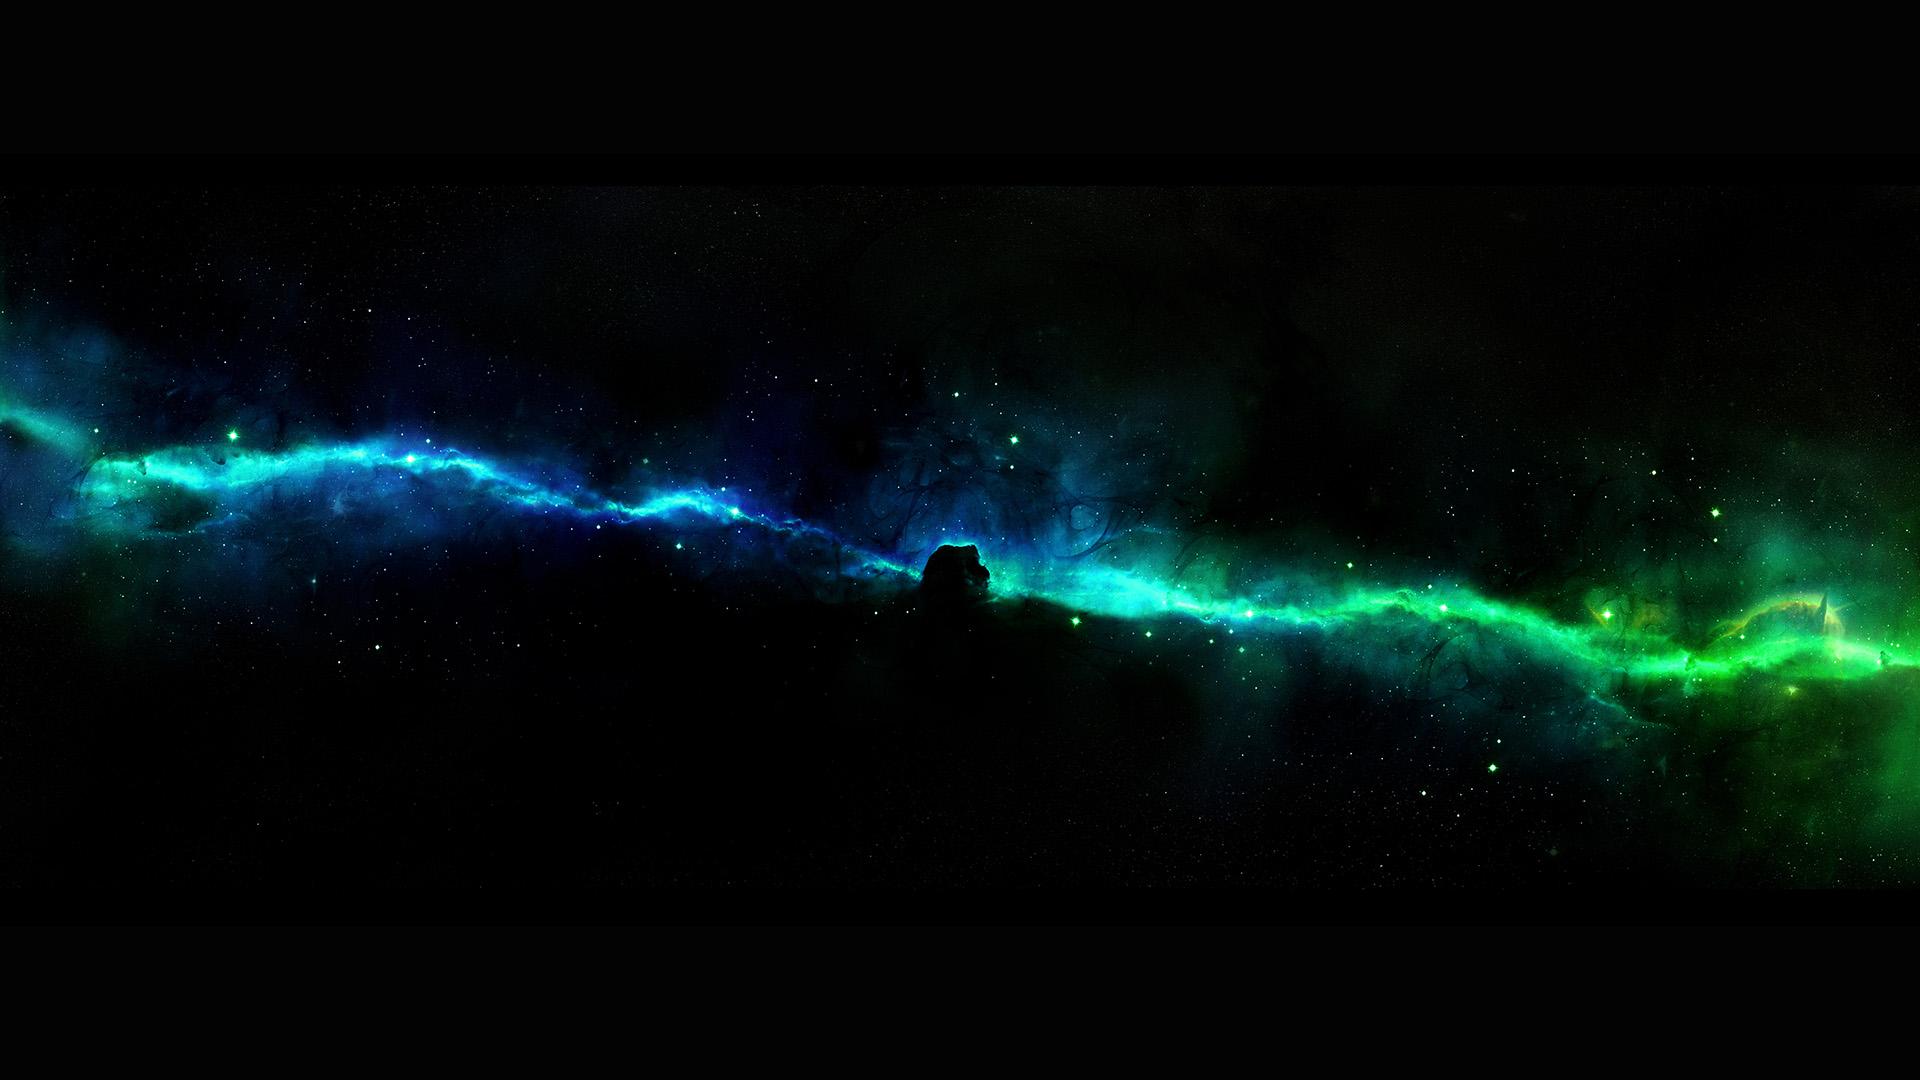 Ipad Retina Wallpapers Space: Am46-star-road-river-space-dark-aurora